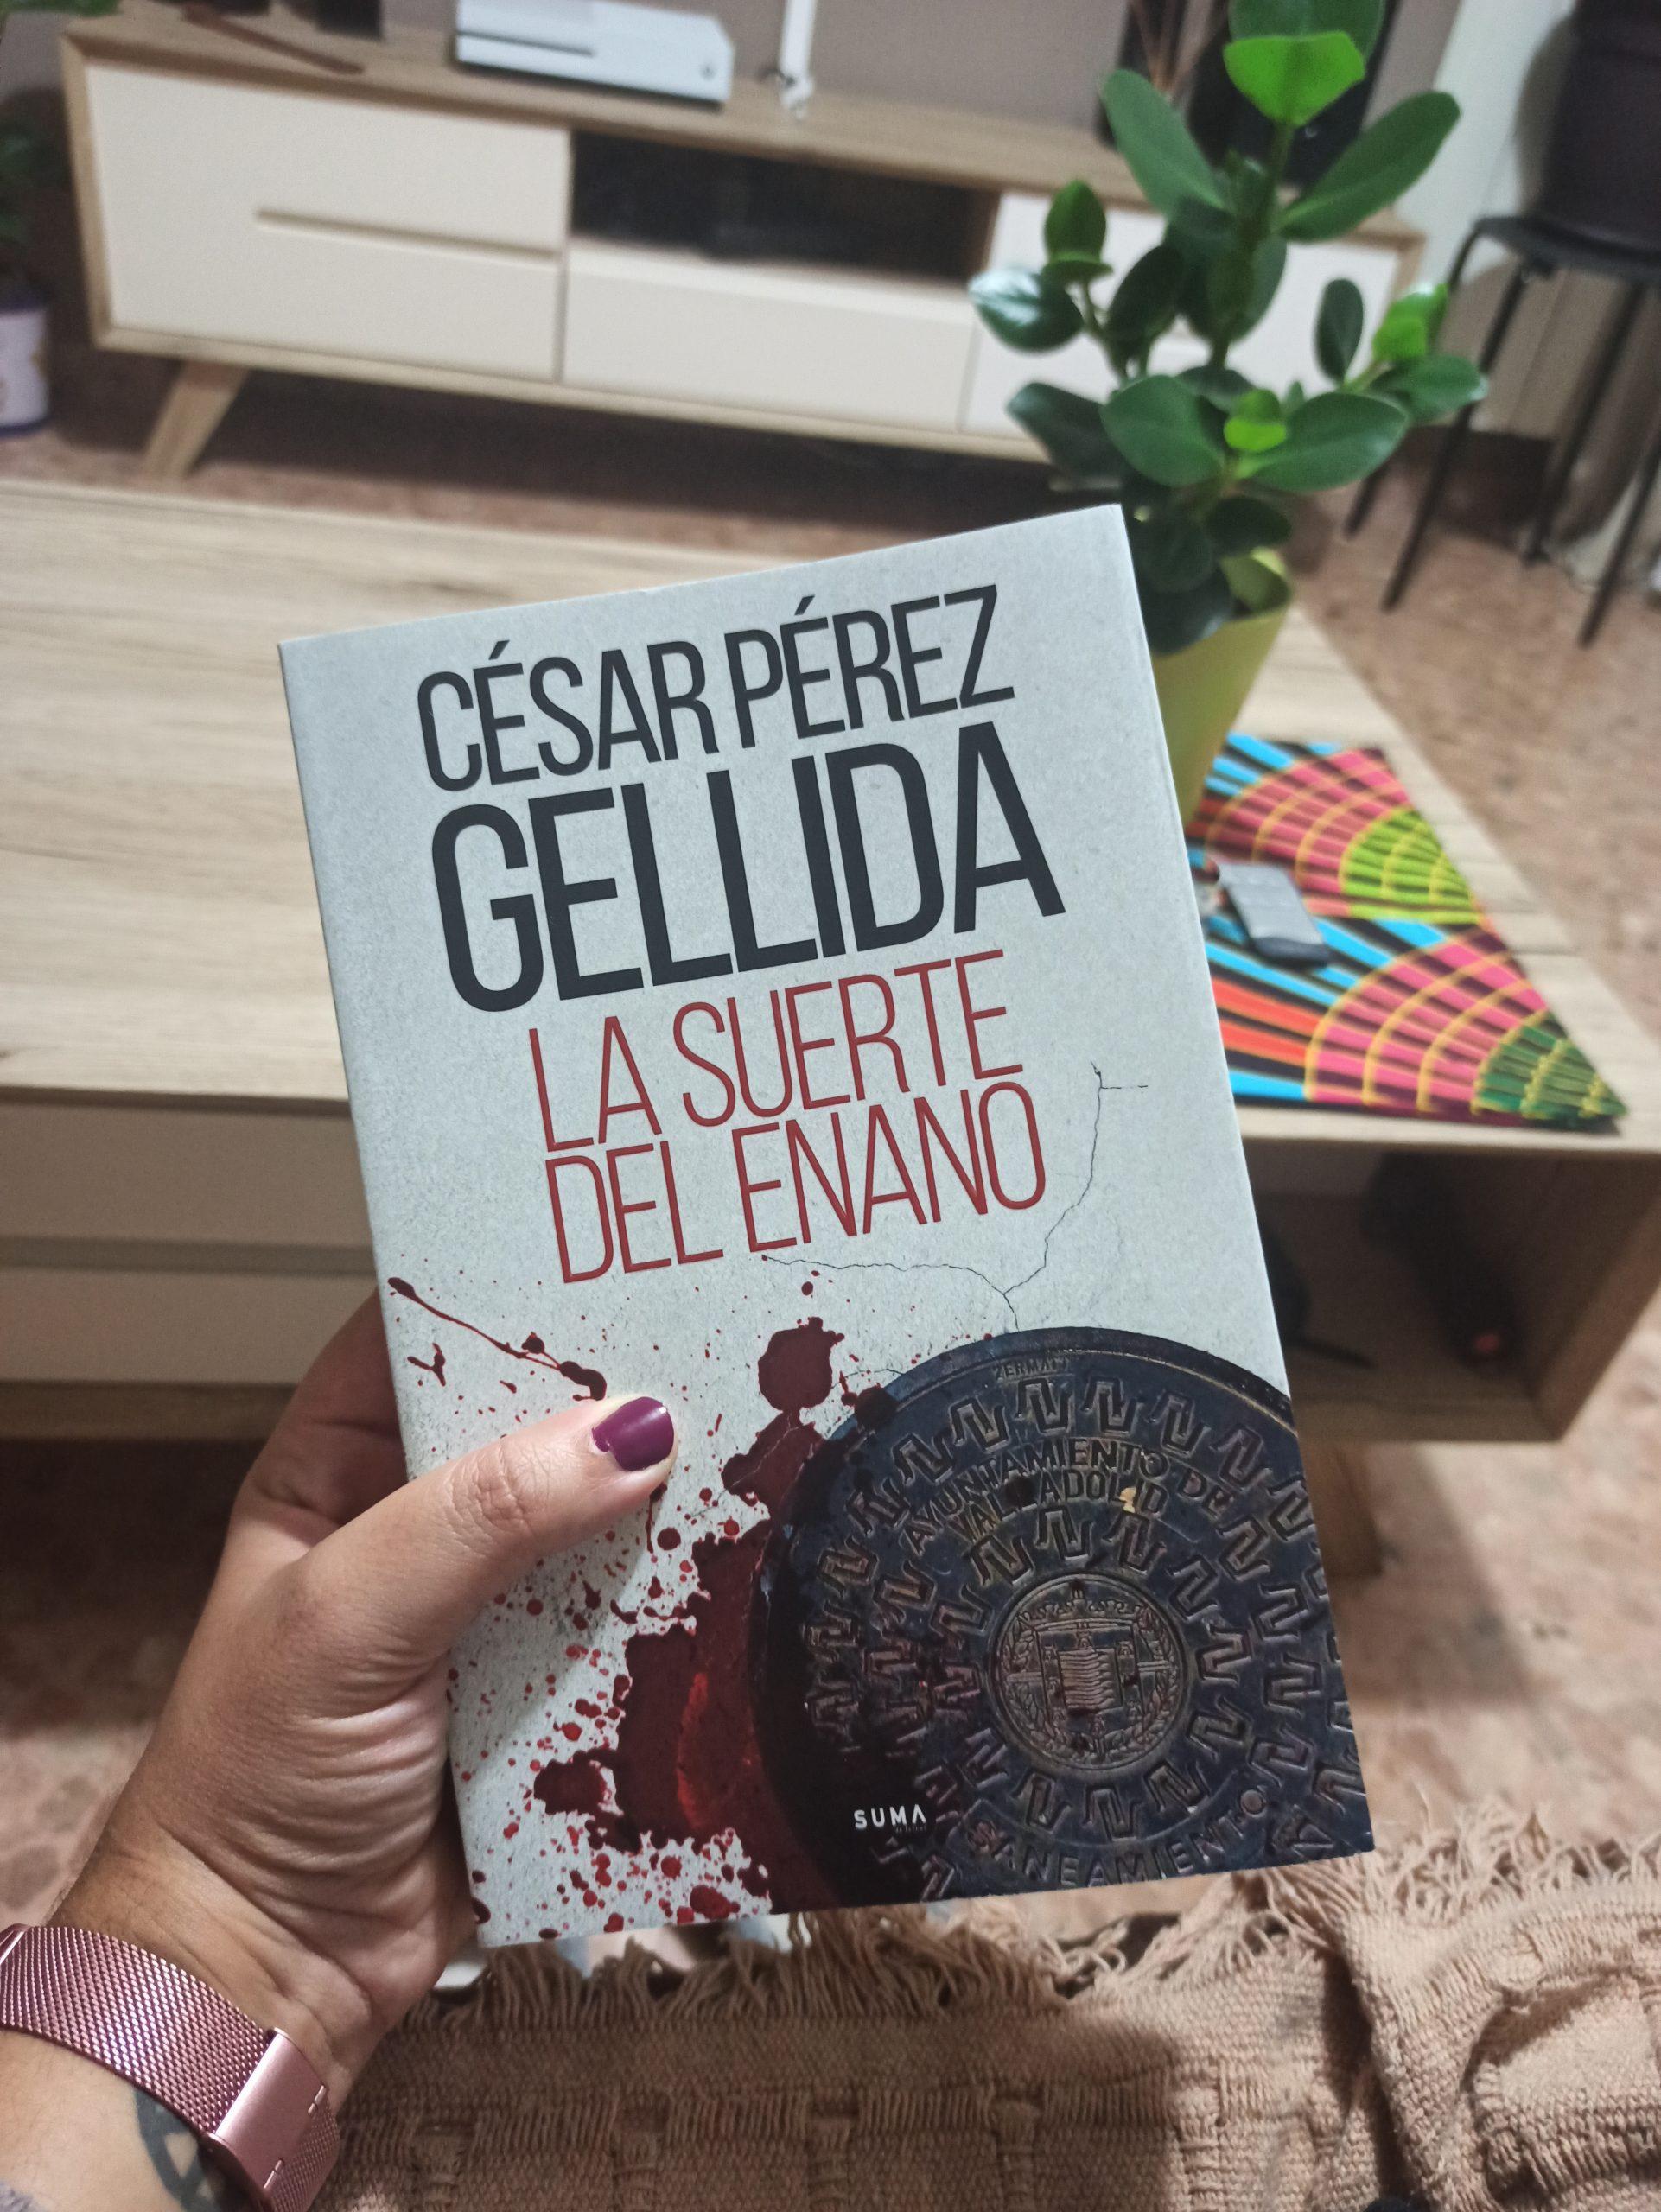 LA SUERTE DEL ENANO, de César Pérez Gellida.